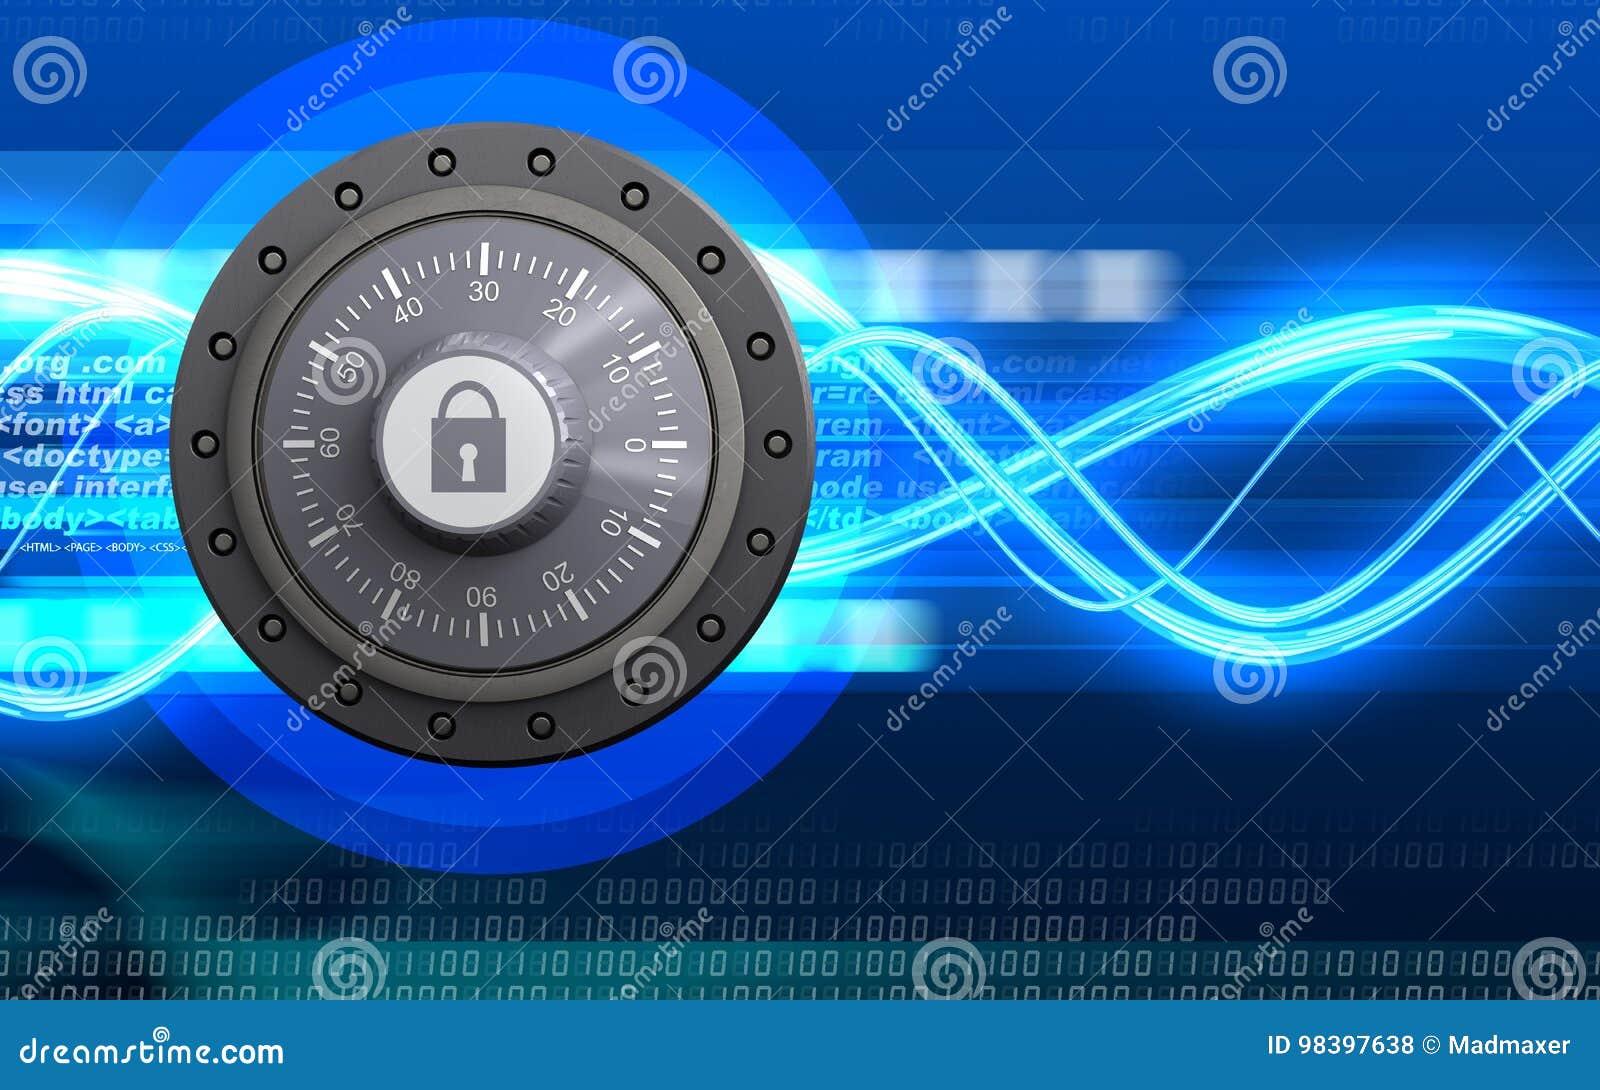 3d combination lock blank stock illustration  Illustration